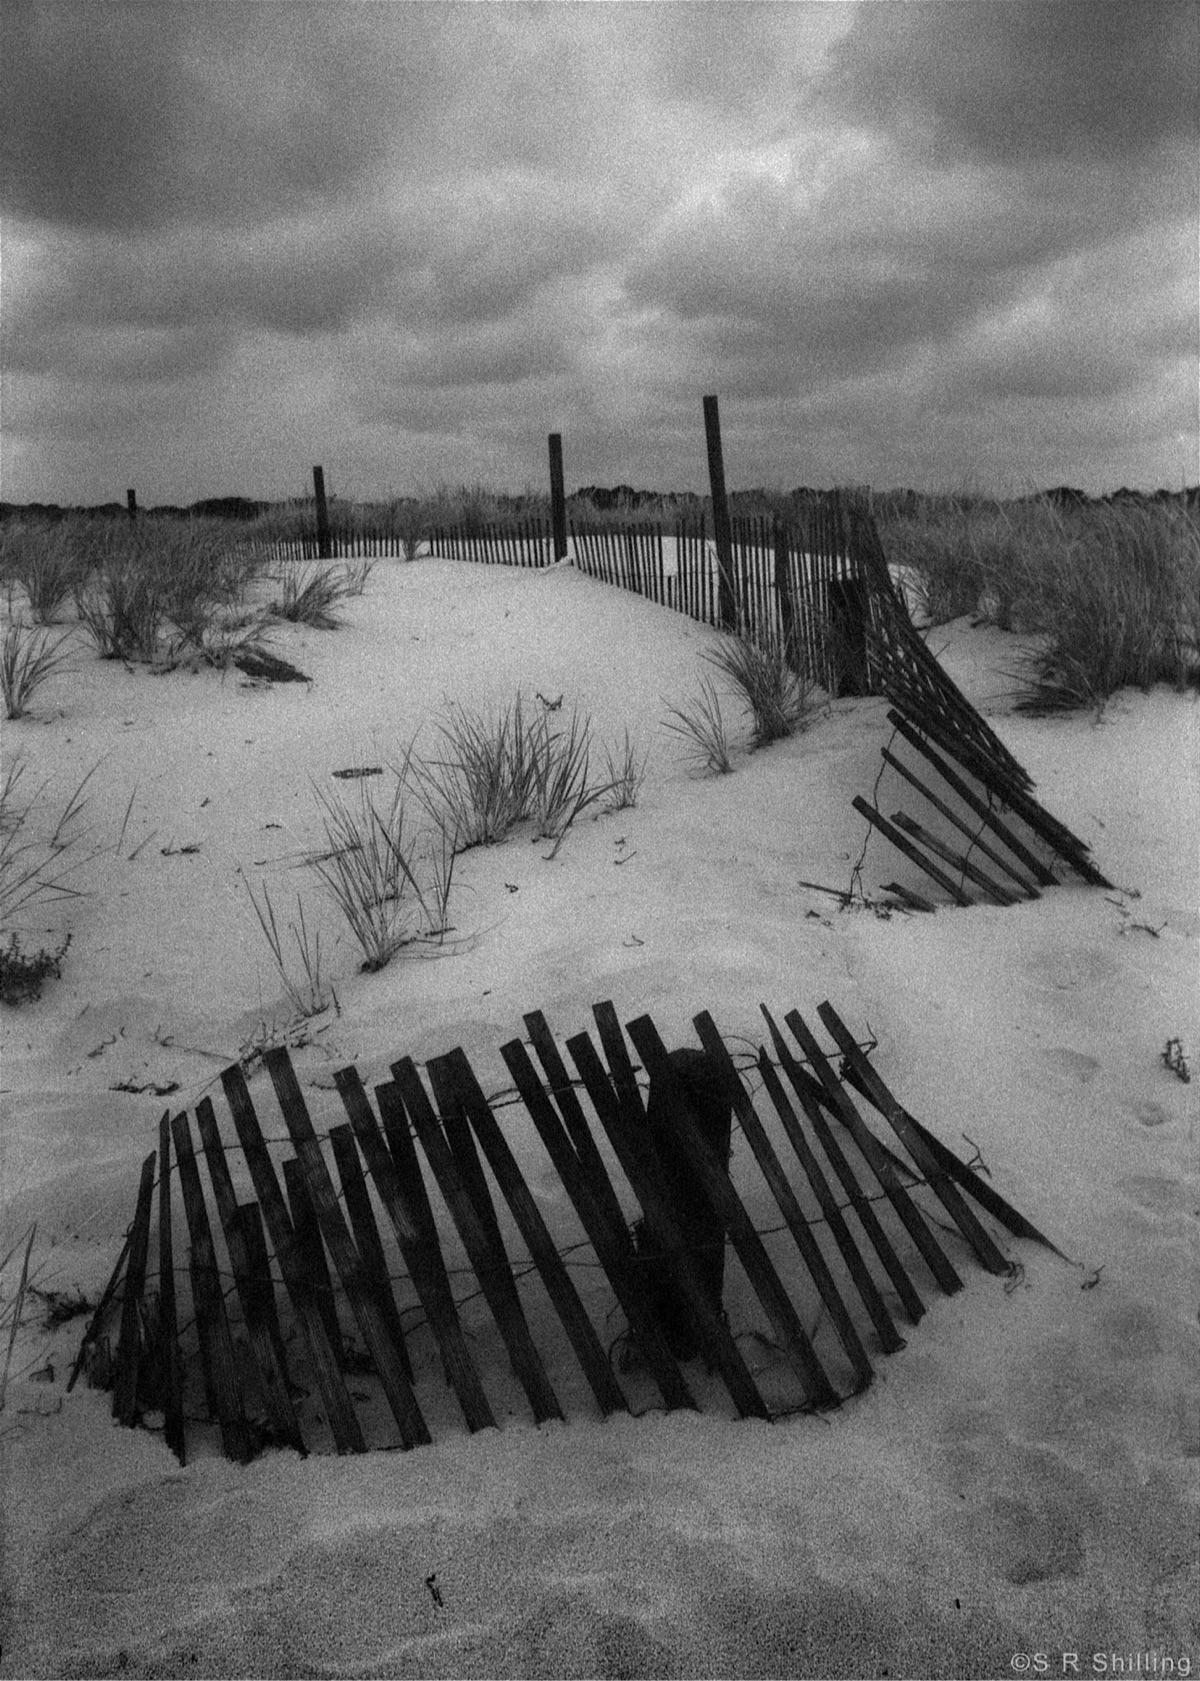 Island Beach State Park, NJ - 2 - sr-shilling | ello